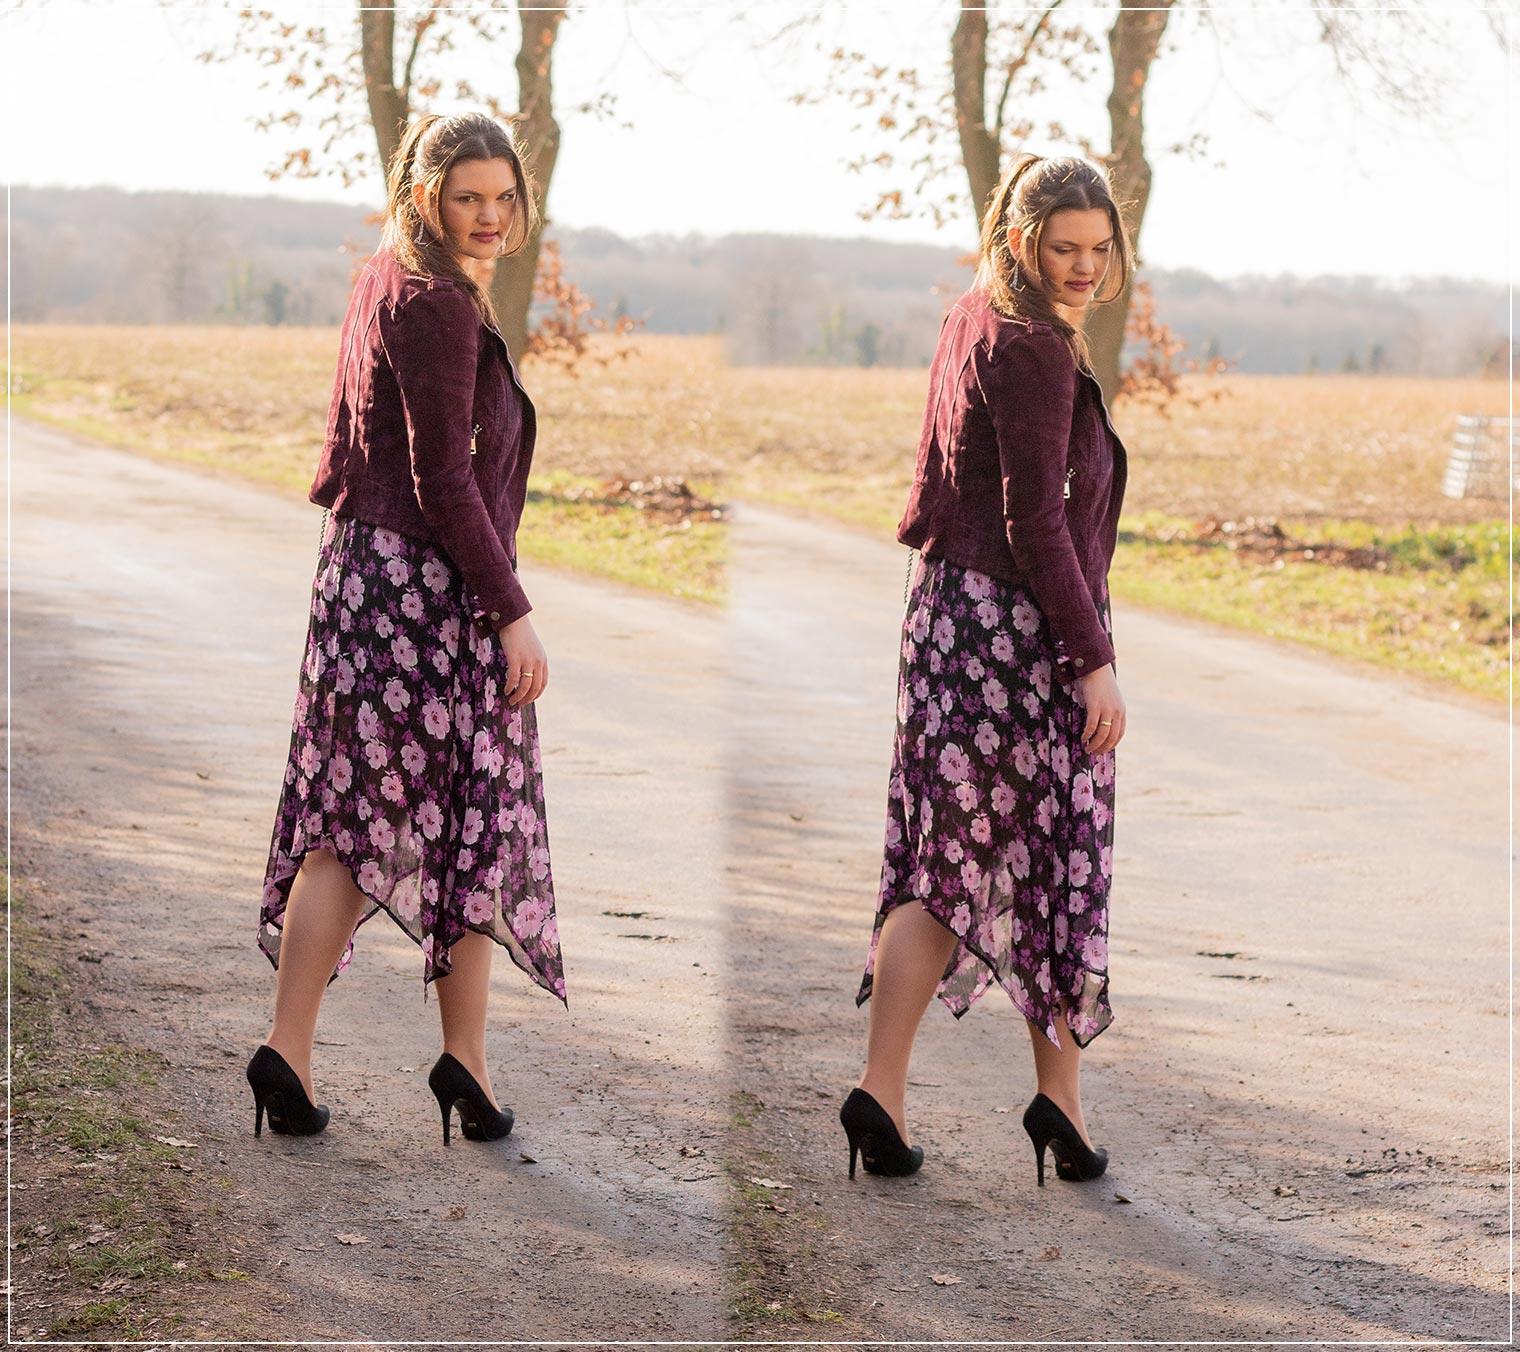 blumiger Frühlingslook in lila aus Midikleid und Lederjacke stylen